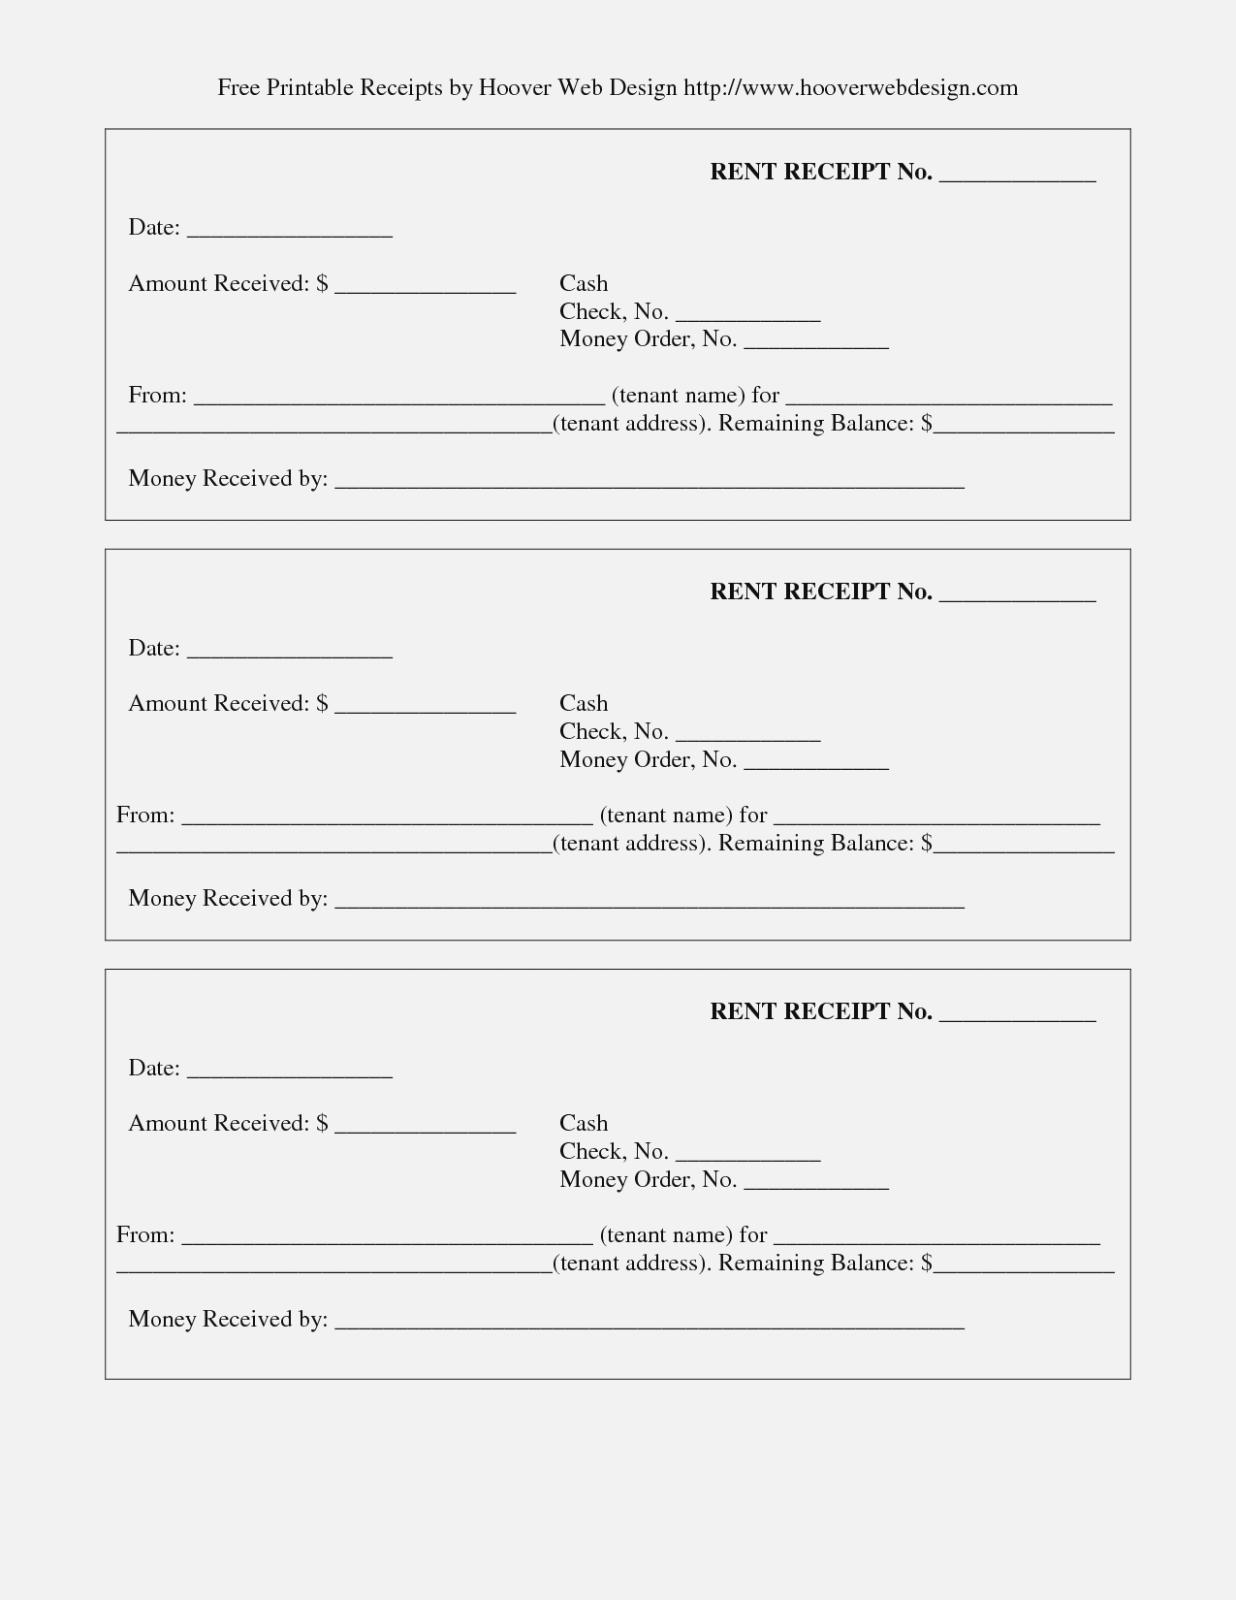 Unique Printable Receipts Exceltemplate Xls Xlstemplate Xlsformat Excelformat Microso Receipt Template Job Application Cover Letter Free Receipt Template